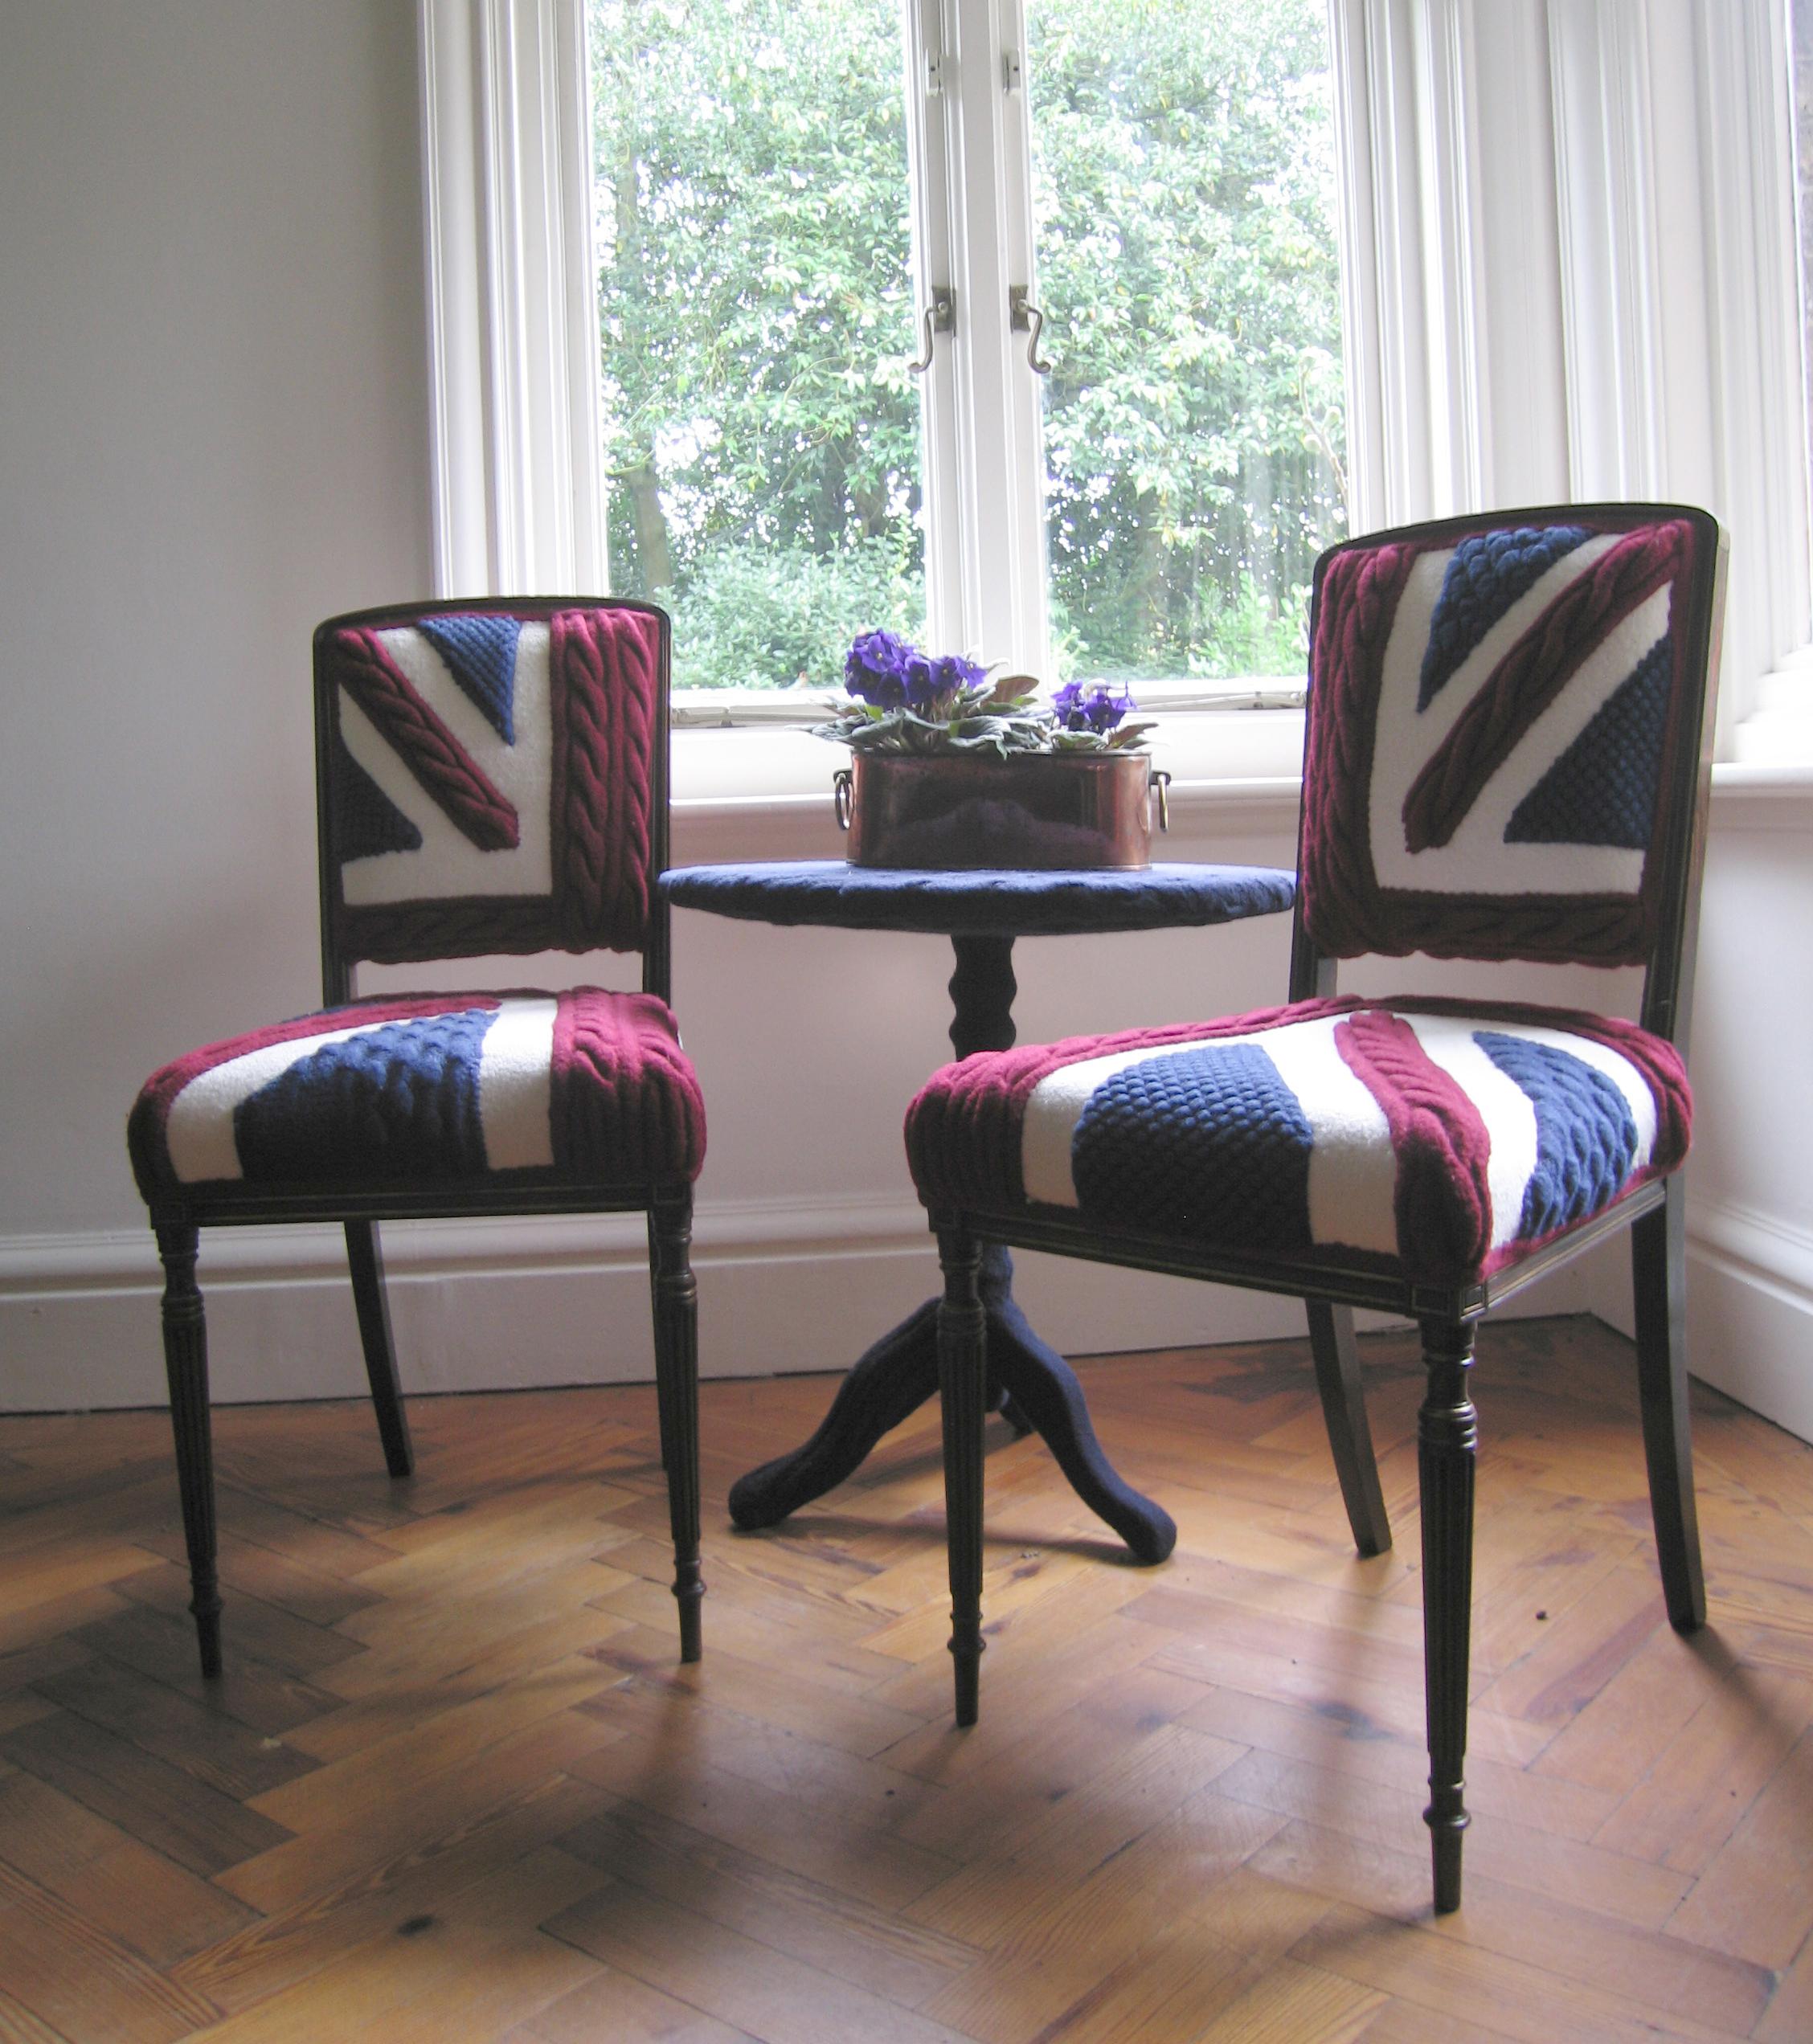 vernon panton chair swing newborn seating the design hub